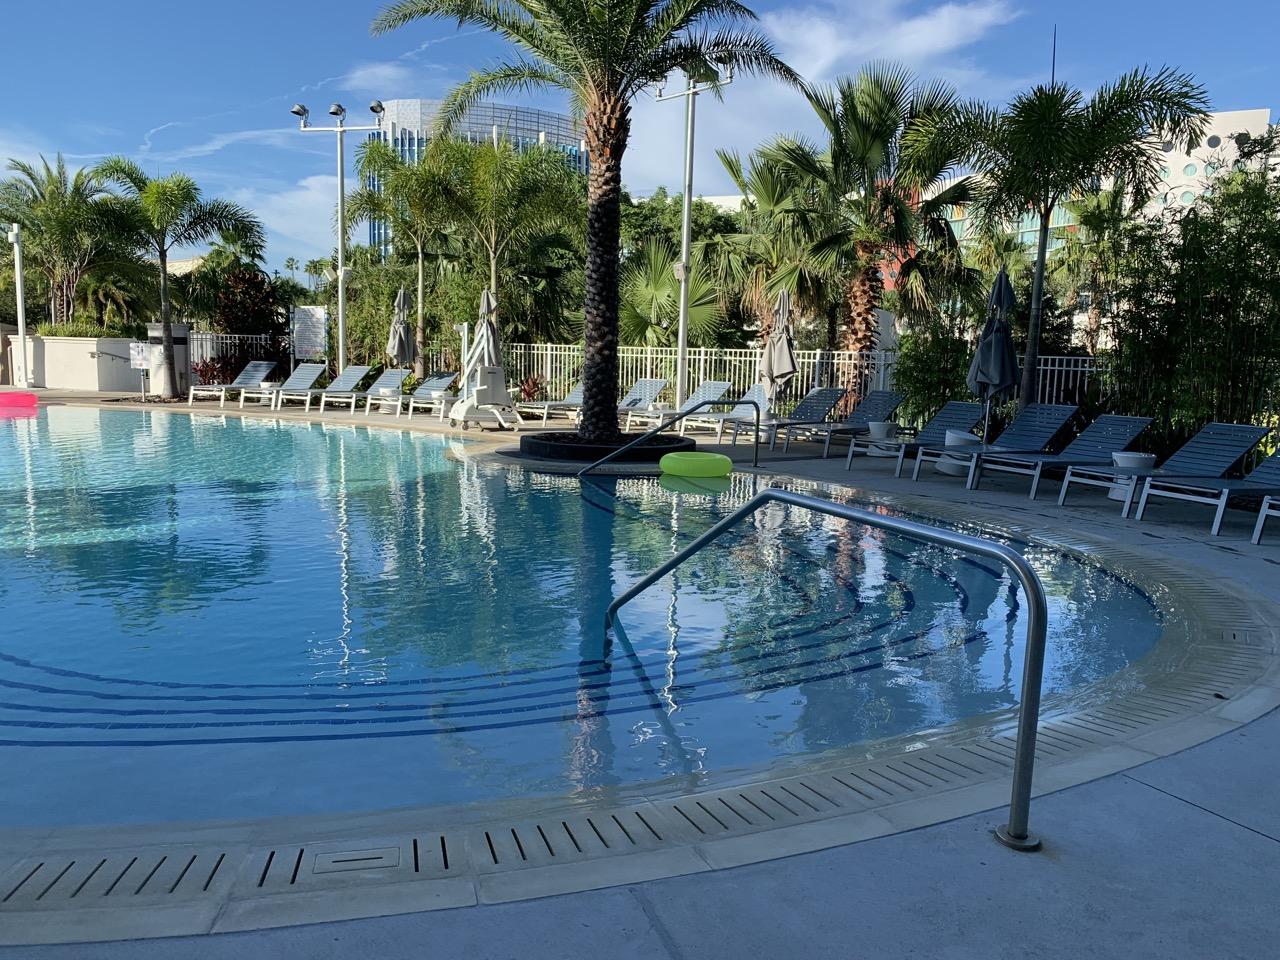 universal aventura hotel review pool 3.jpeg